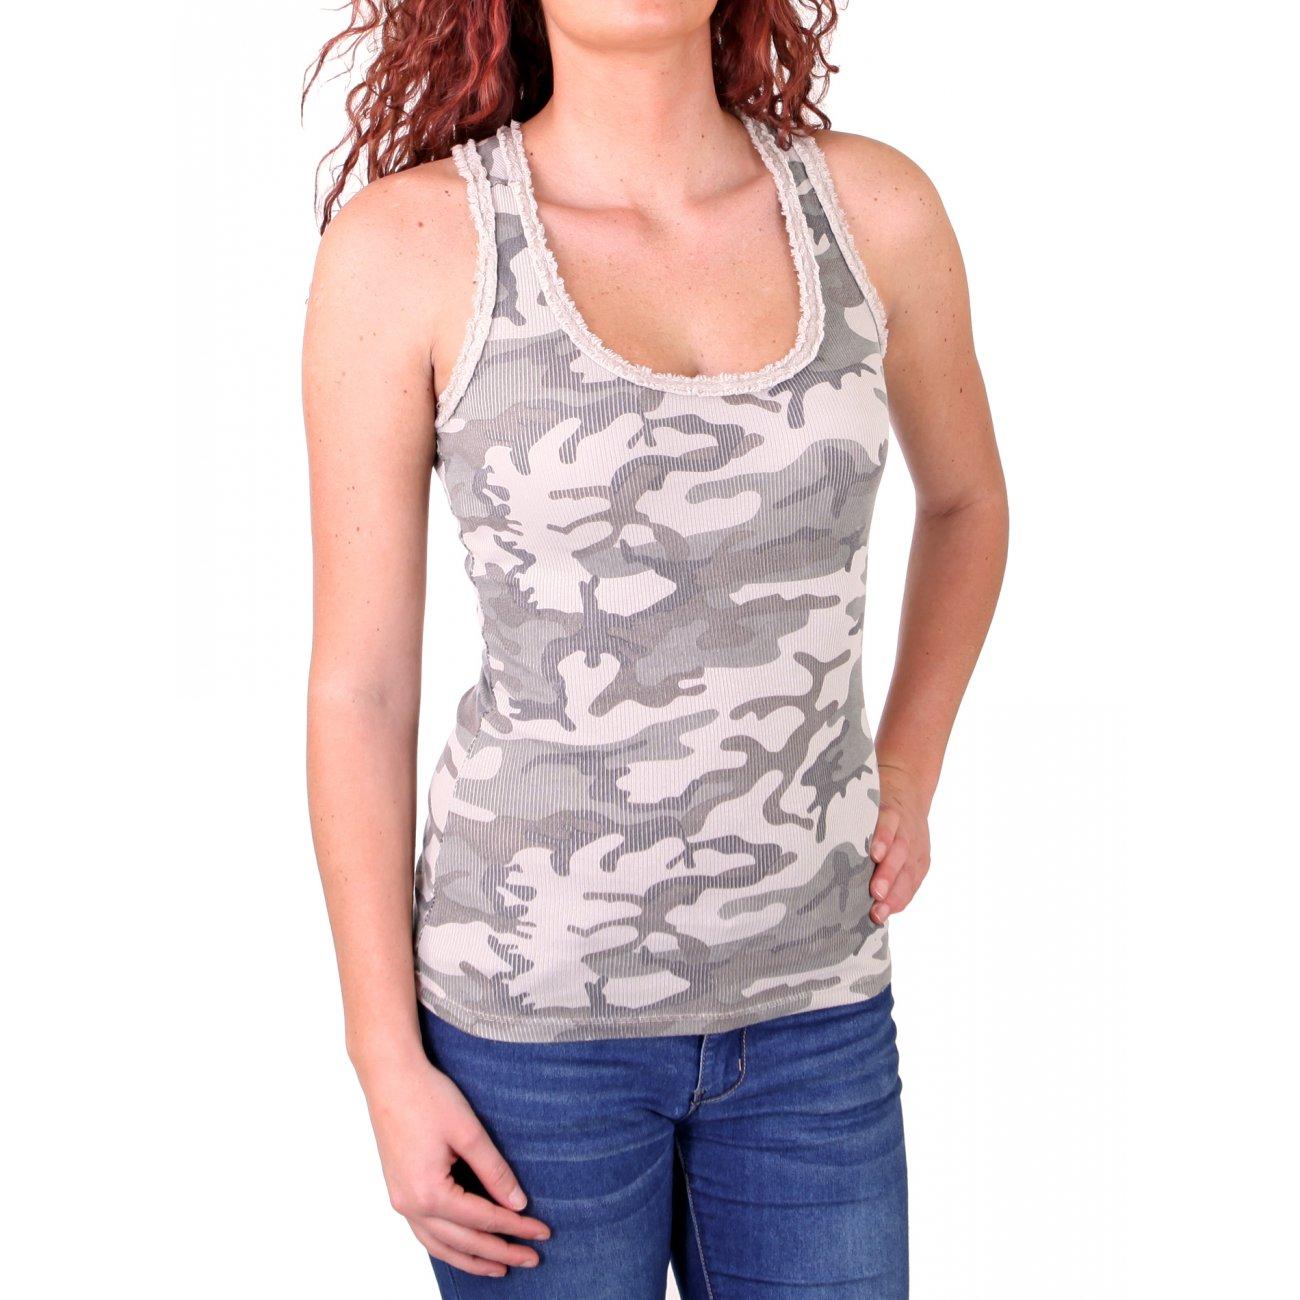 madonna top camouflage tank top rundhals g nstig kaufen. Black Bedroom Furniture Sets. Home Design Ideas